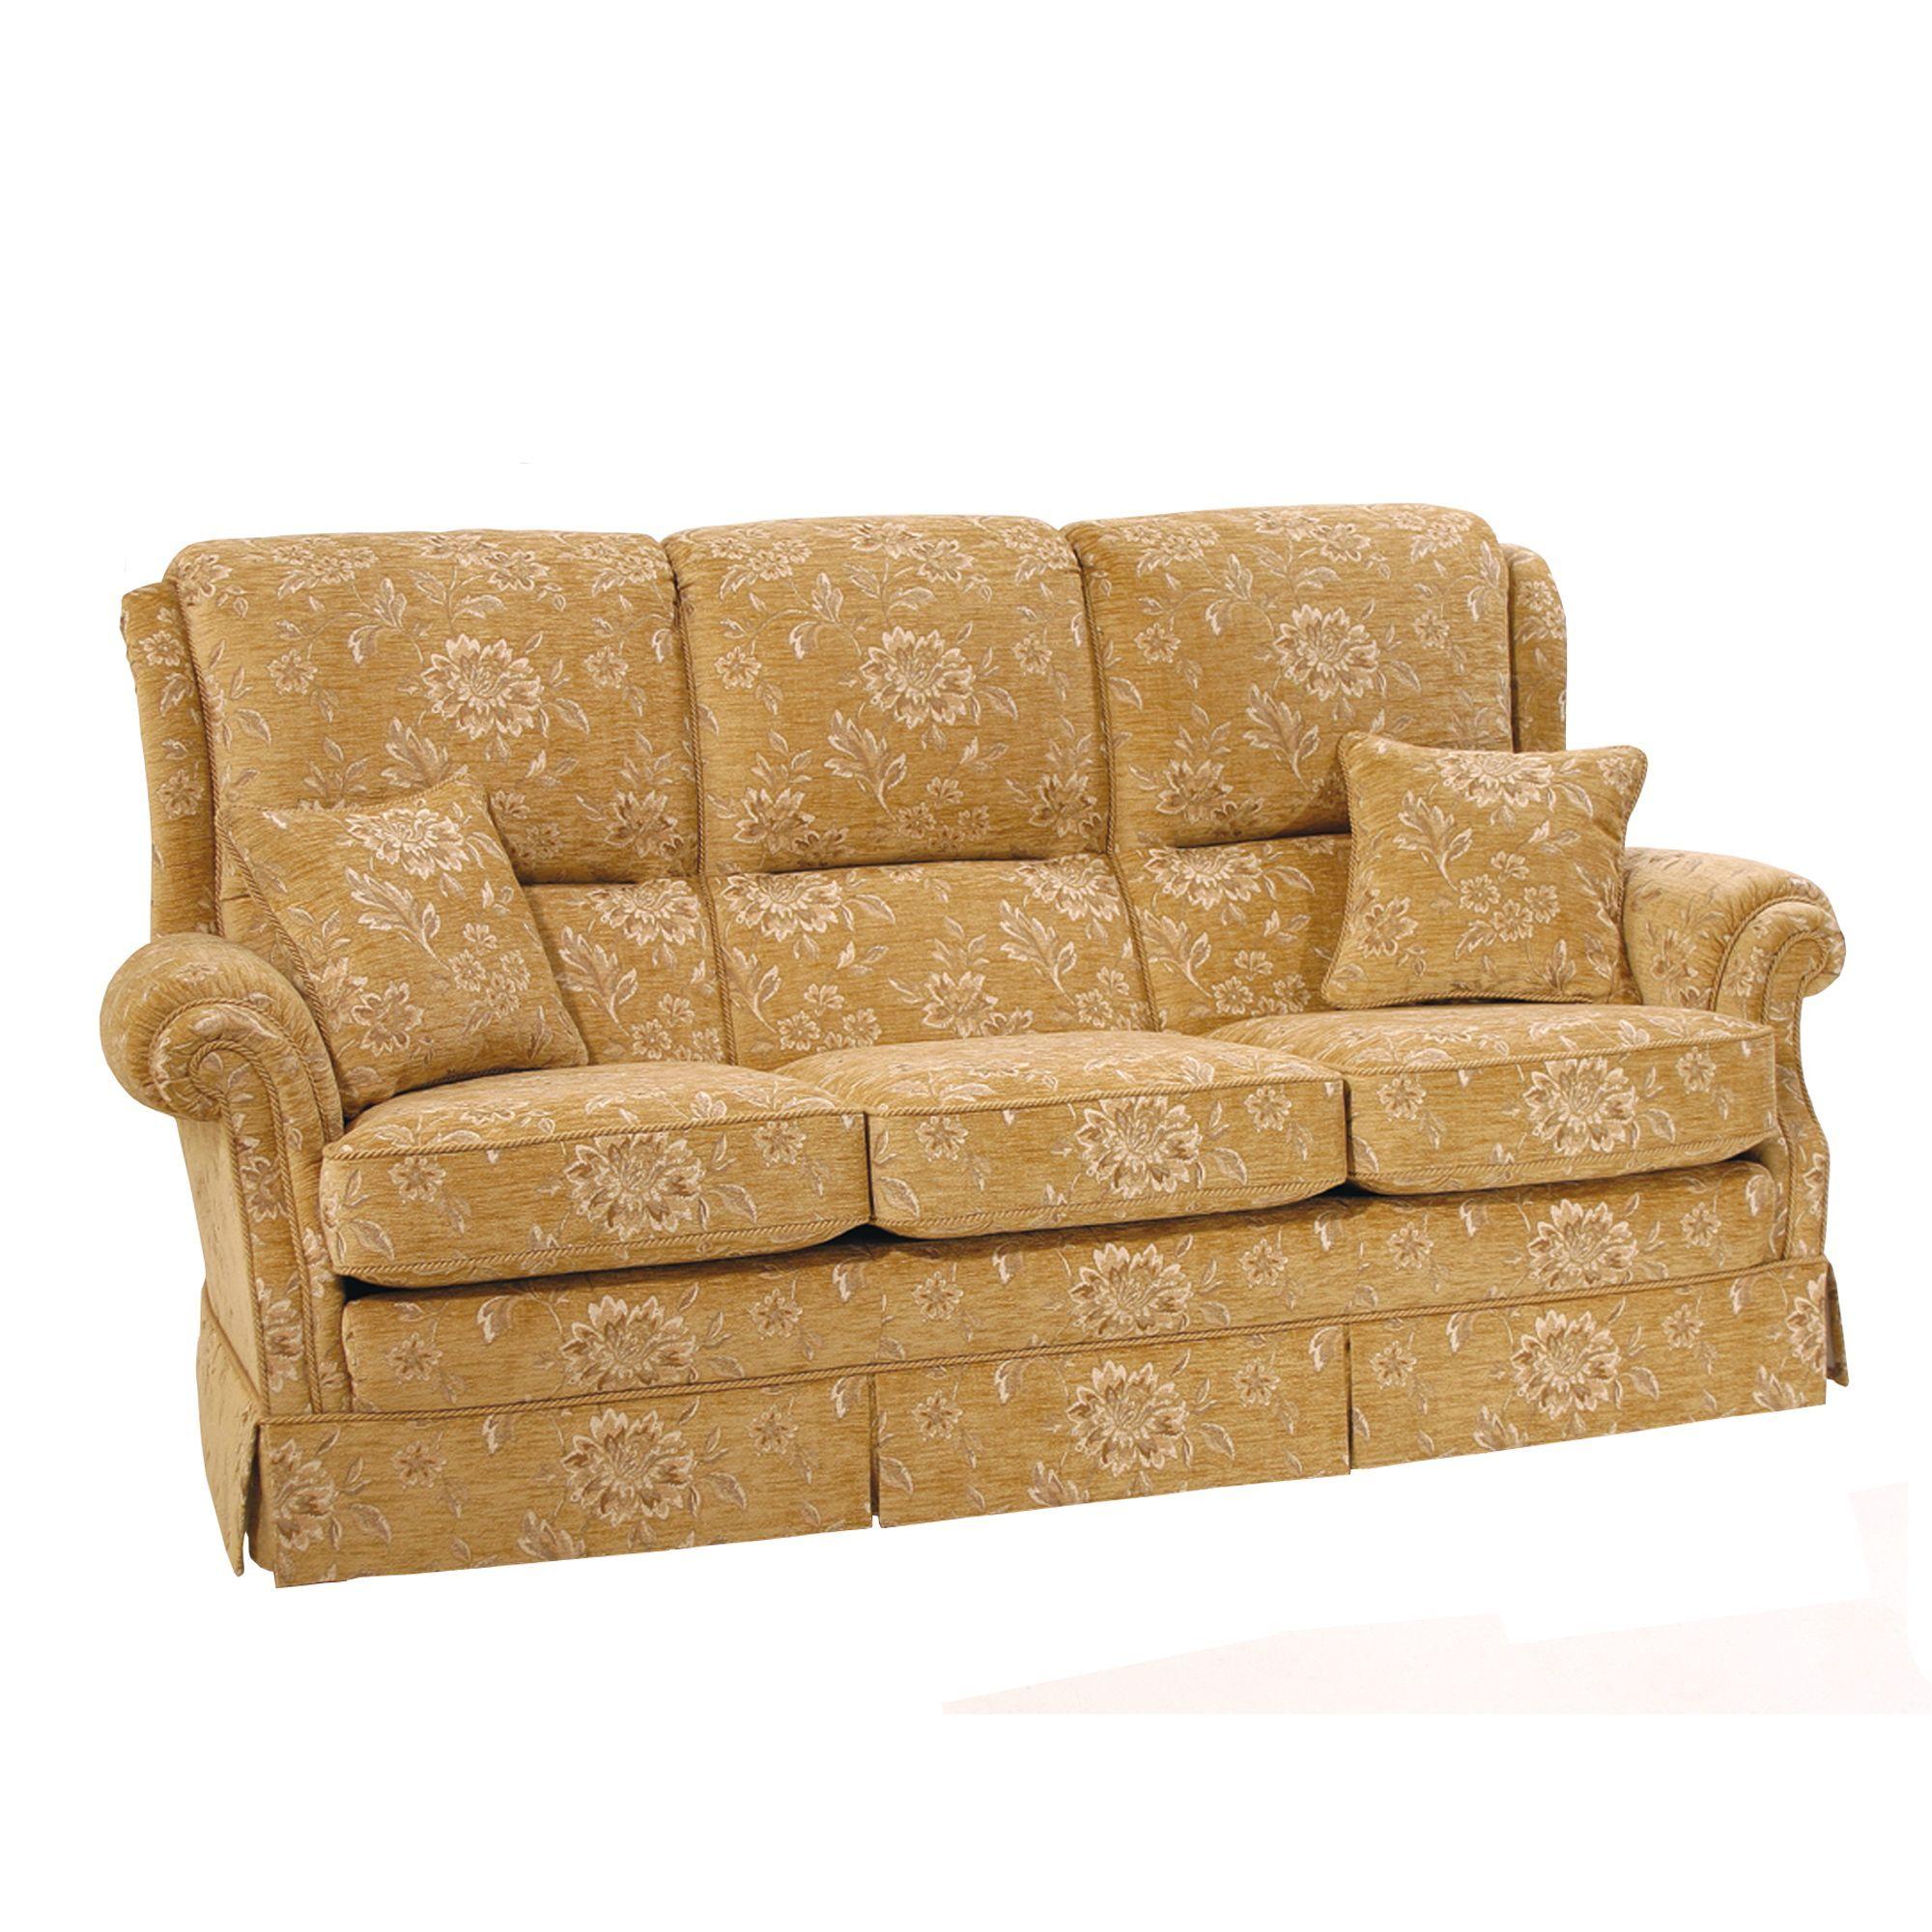 Vale Bridgecraft Sorrento 3 Seater Sofa